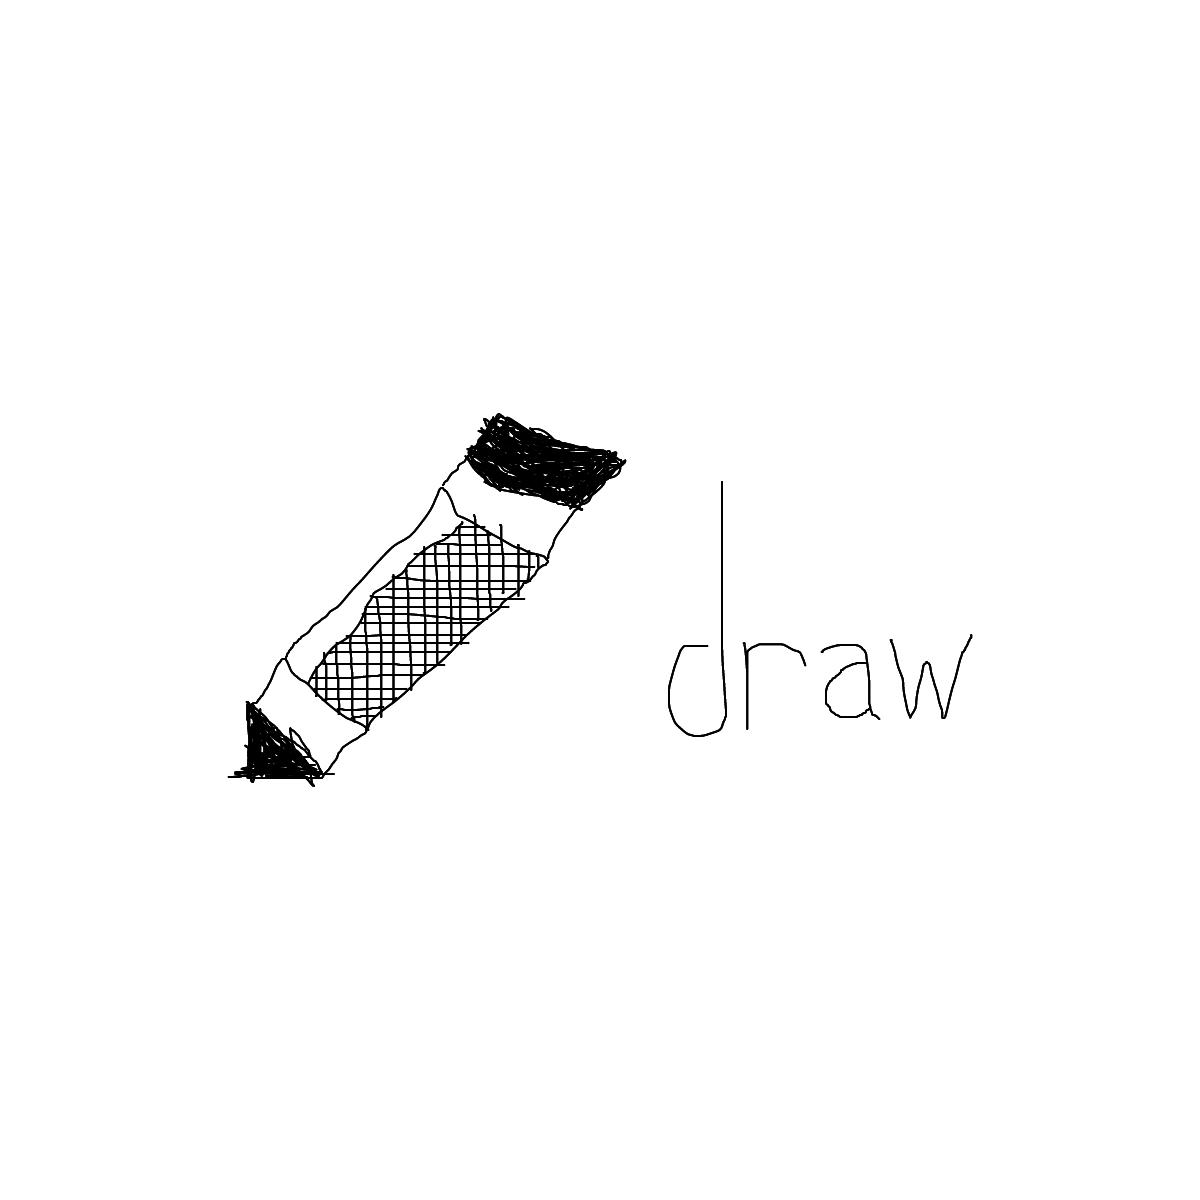 BAAAM drawing#19574 lat:52.4756774902343750lng: 13.4080171585083000